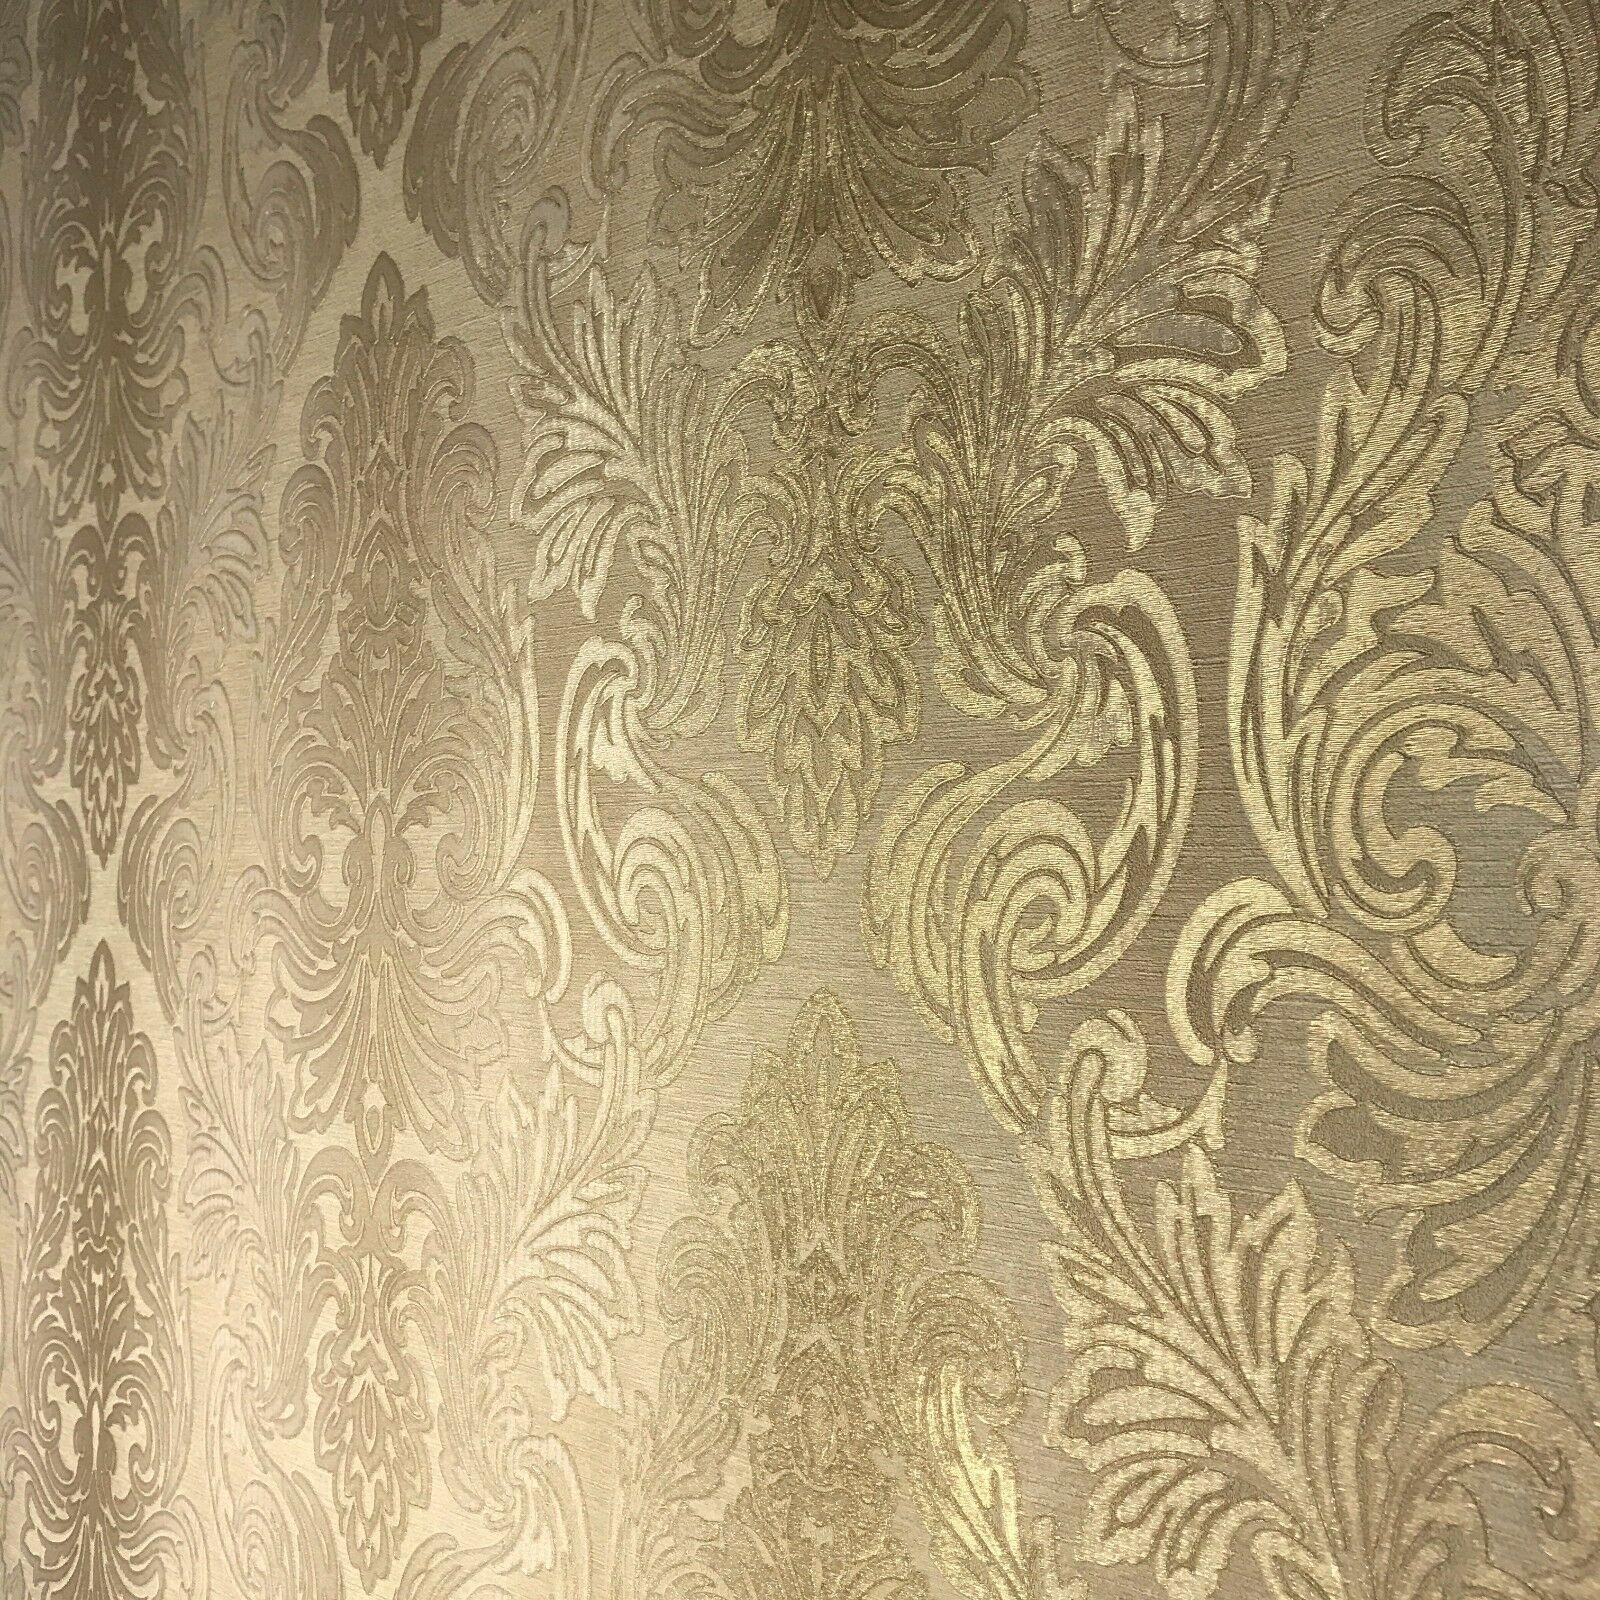 Wallpaper beige tan gold metallic rolls textured Victorian